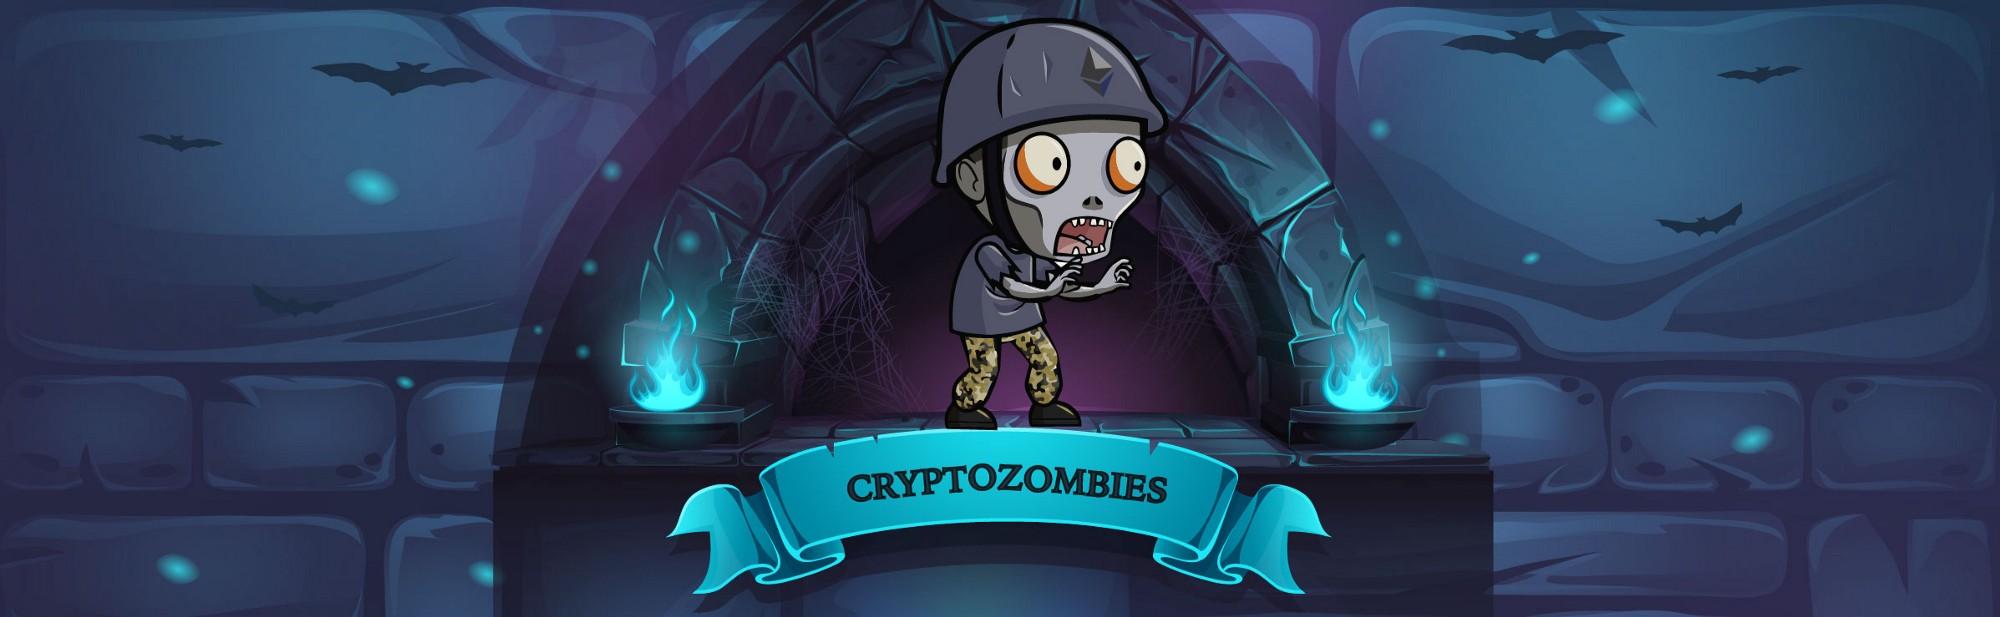 CryptoZombies: игра про блокчейн